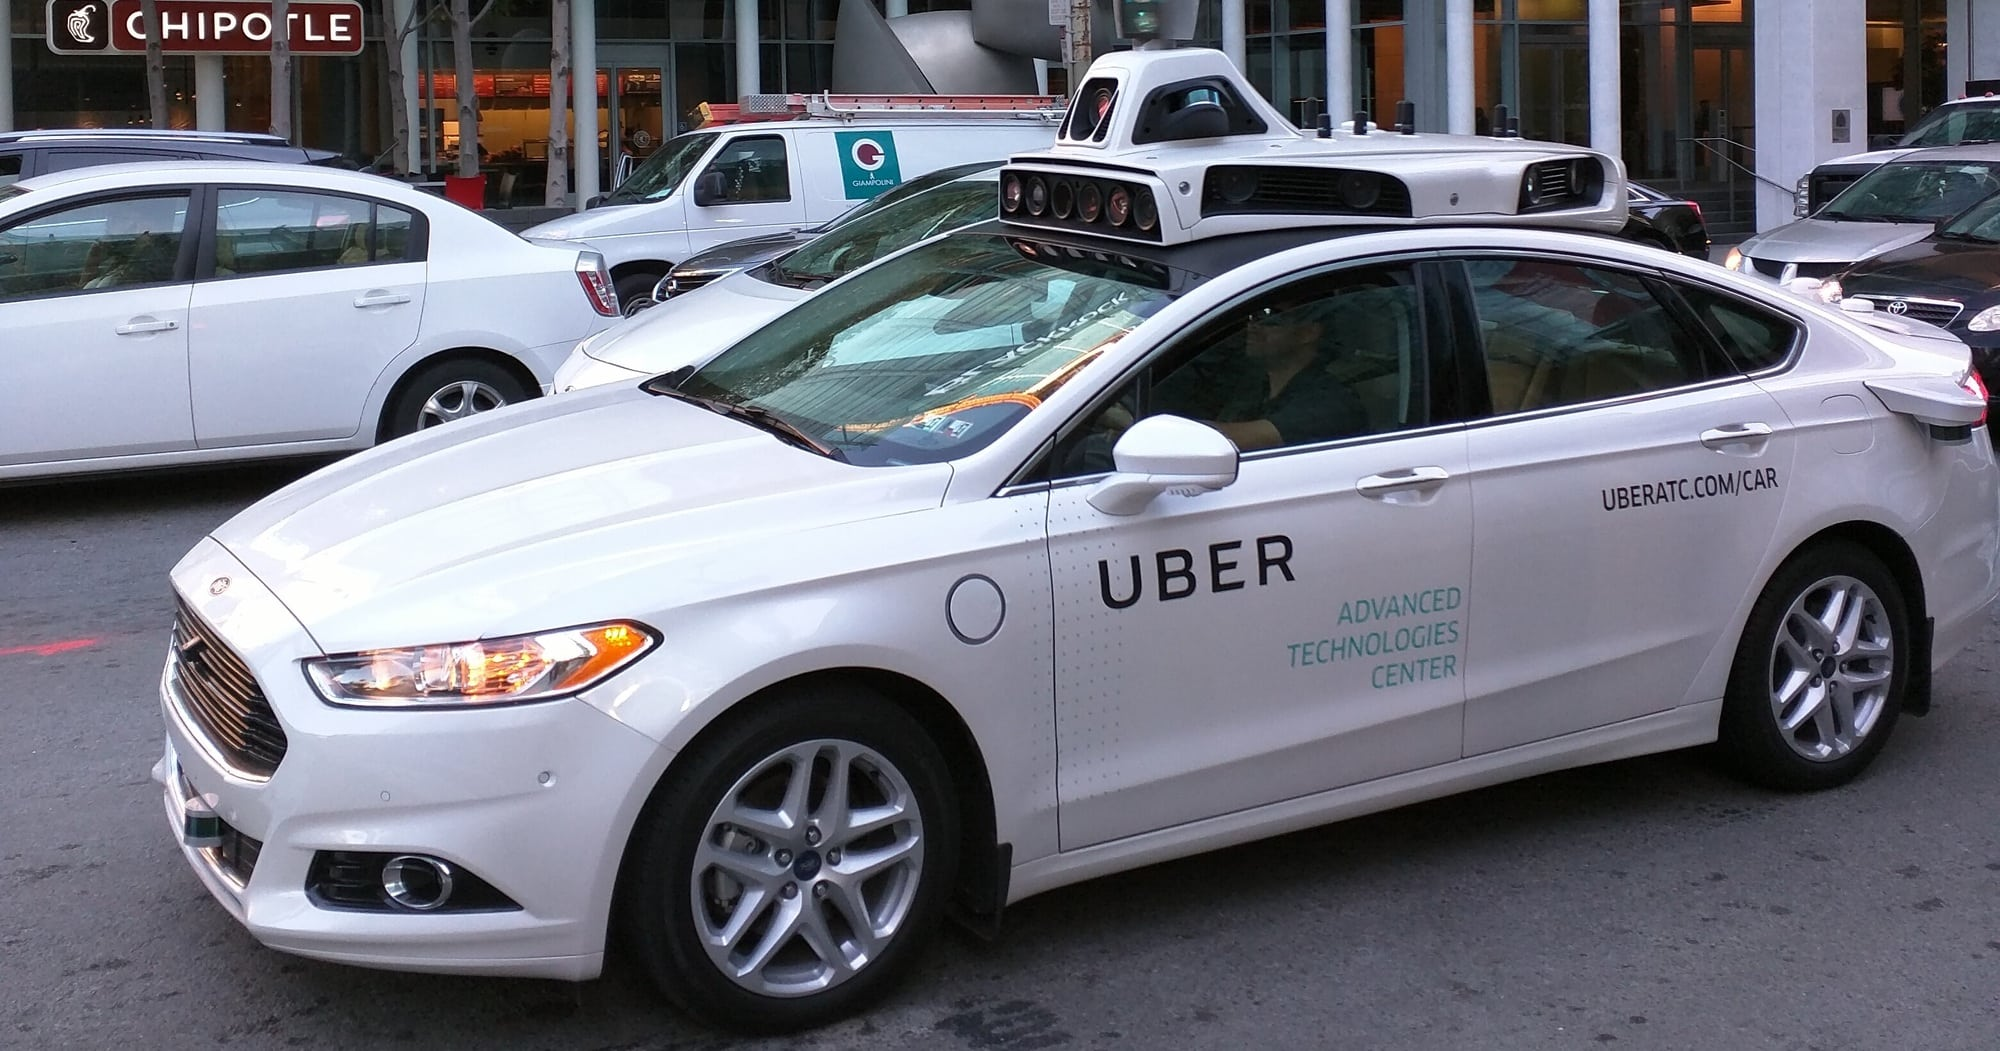 Uber autonomous vehicle